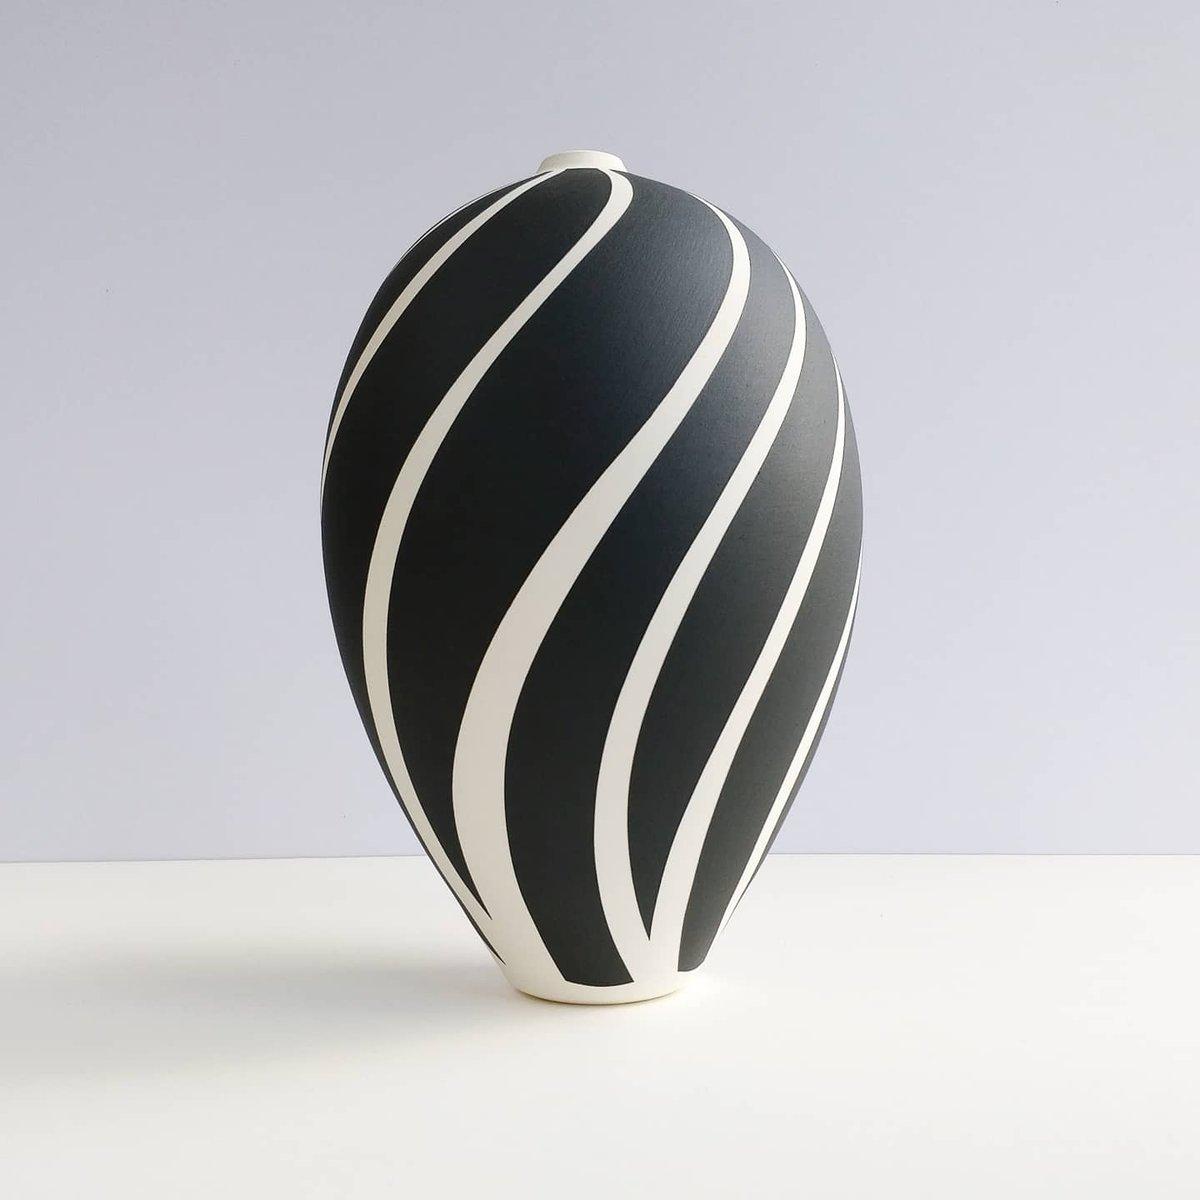 Image of Large Black & White Stripey Vessel